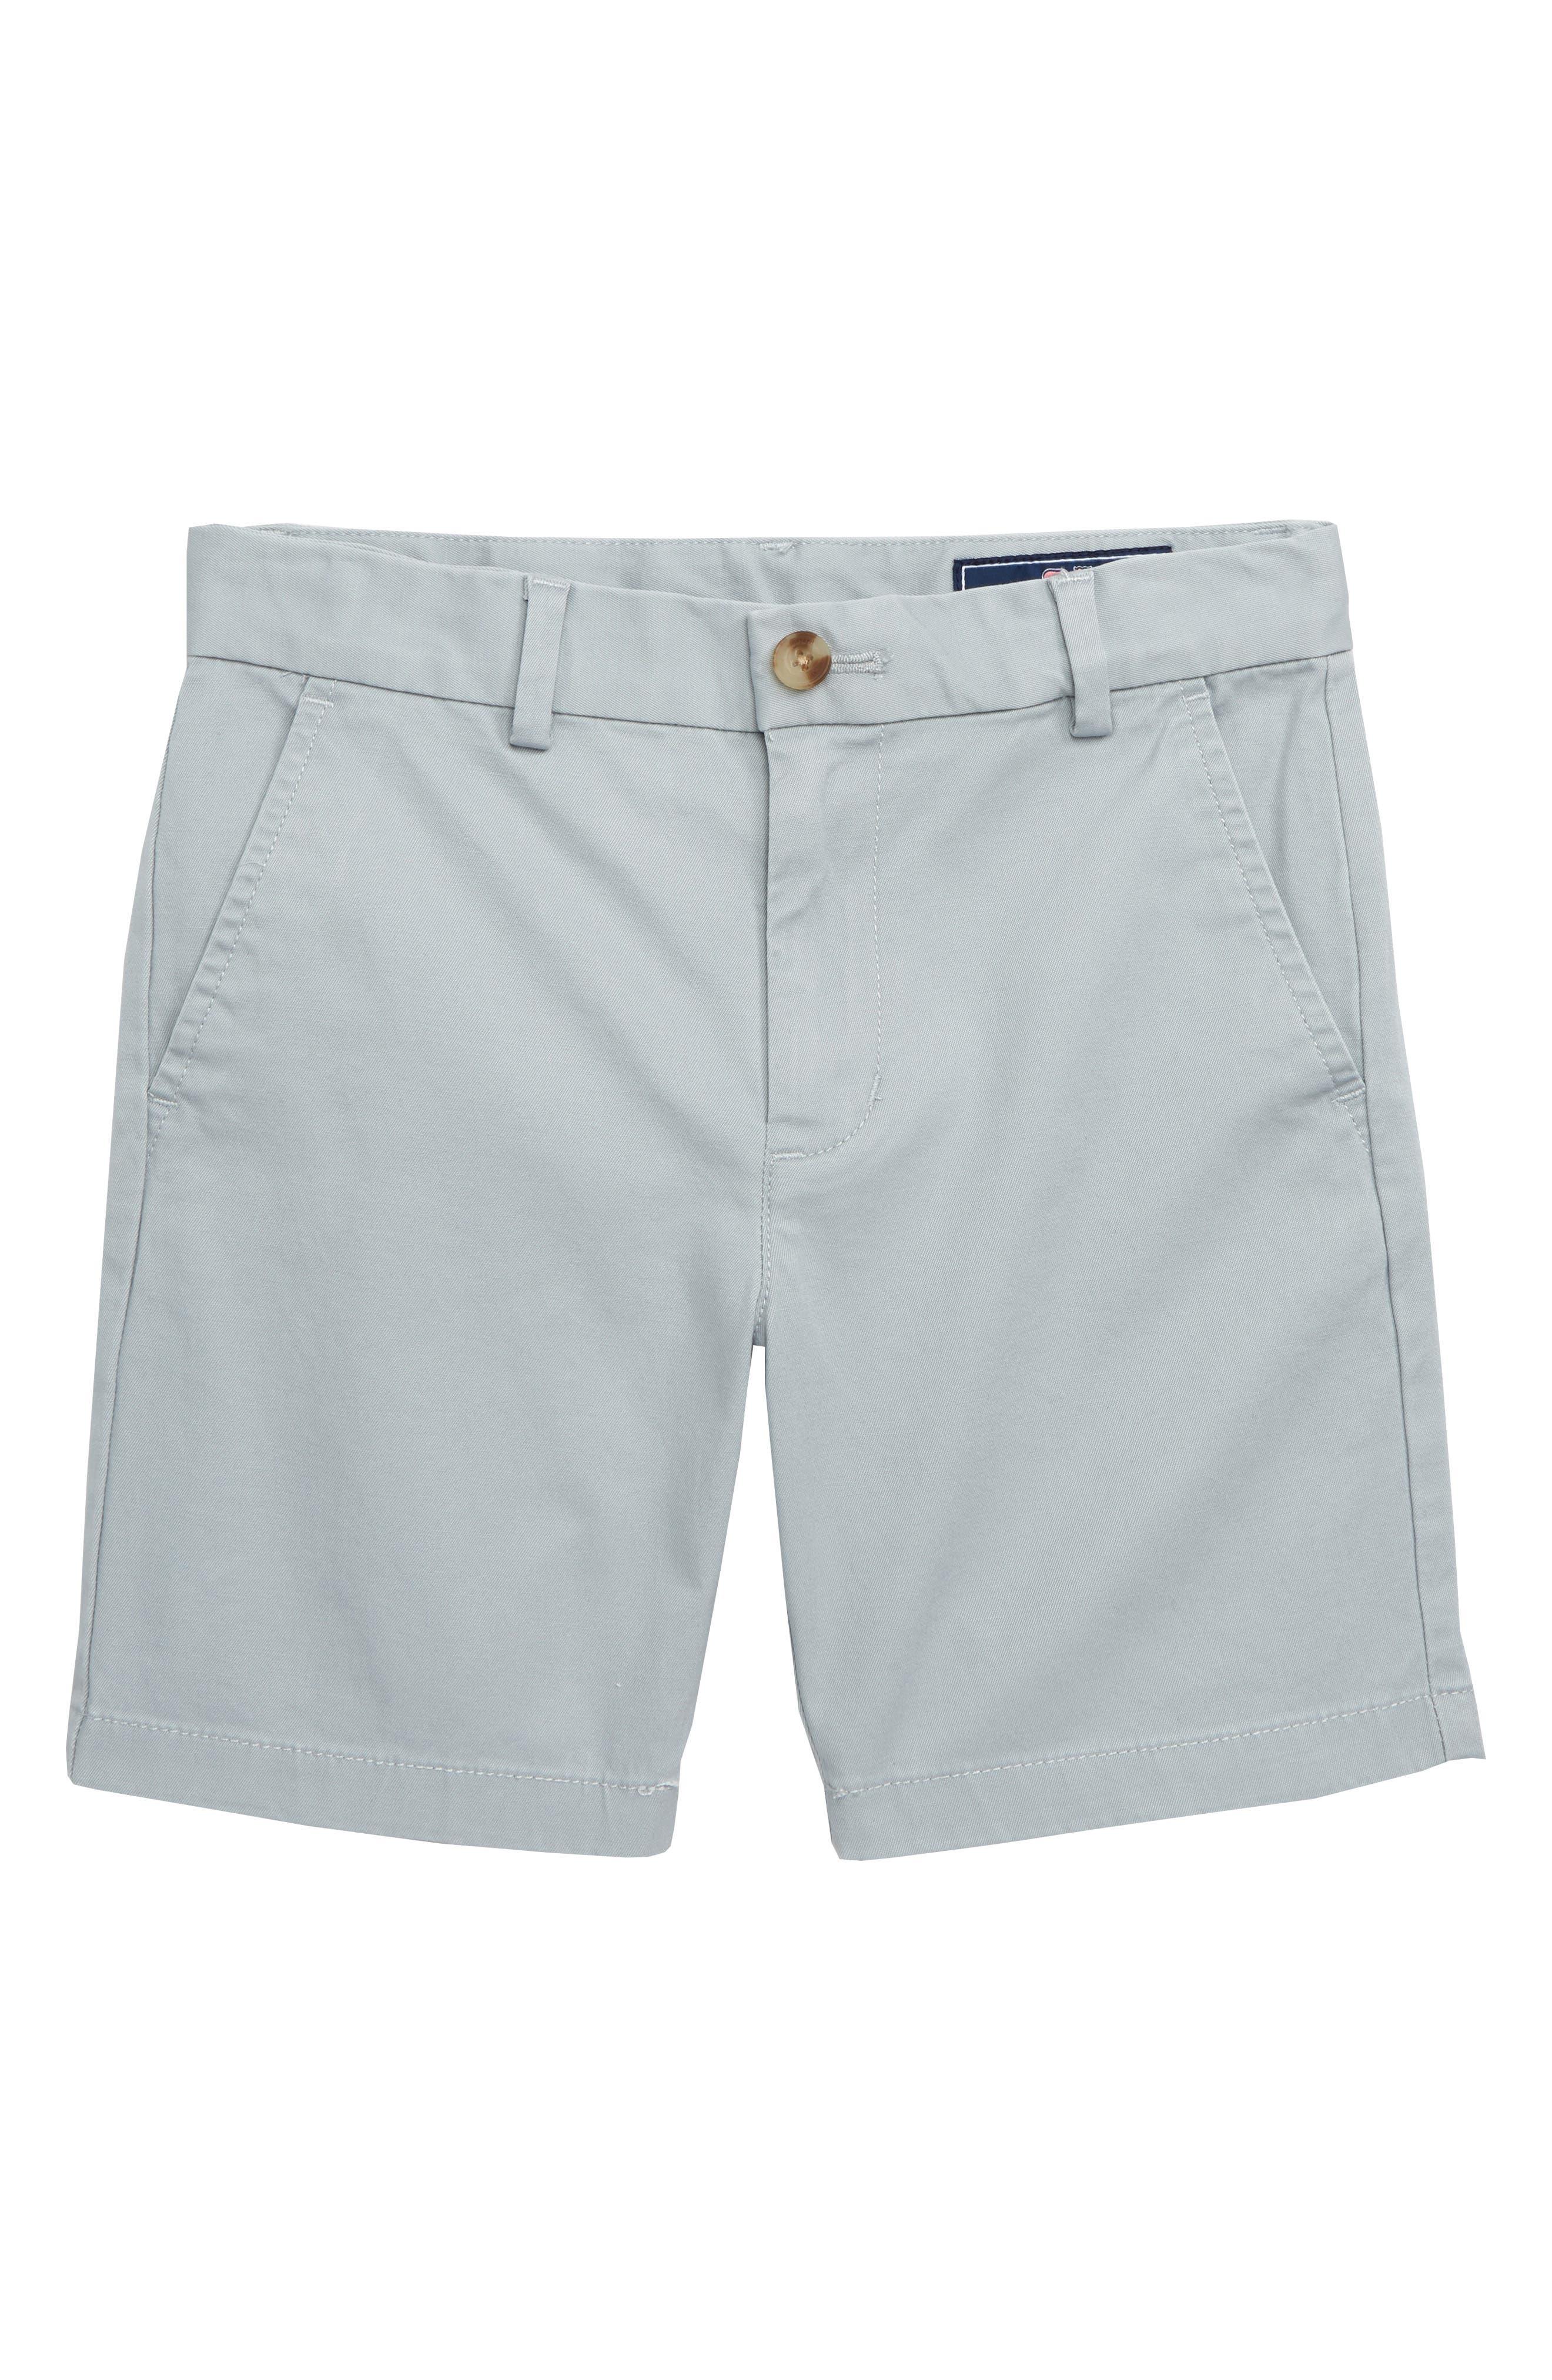 VINEYARD VINES Stretch Breaker Shorts, Main, color, BARRACUDA